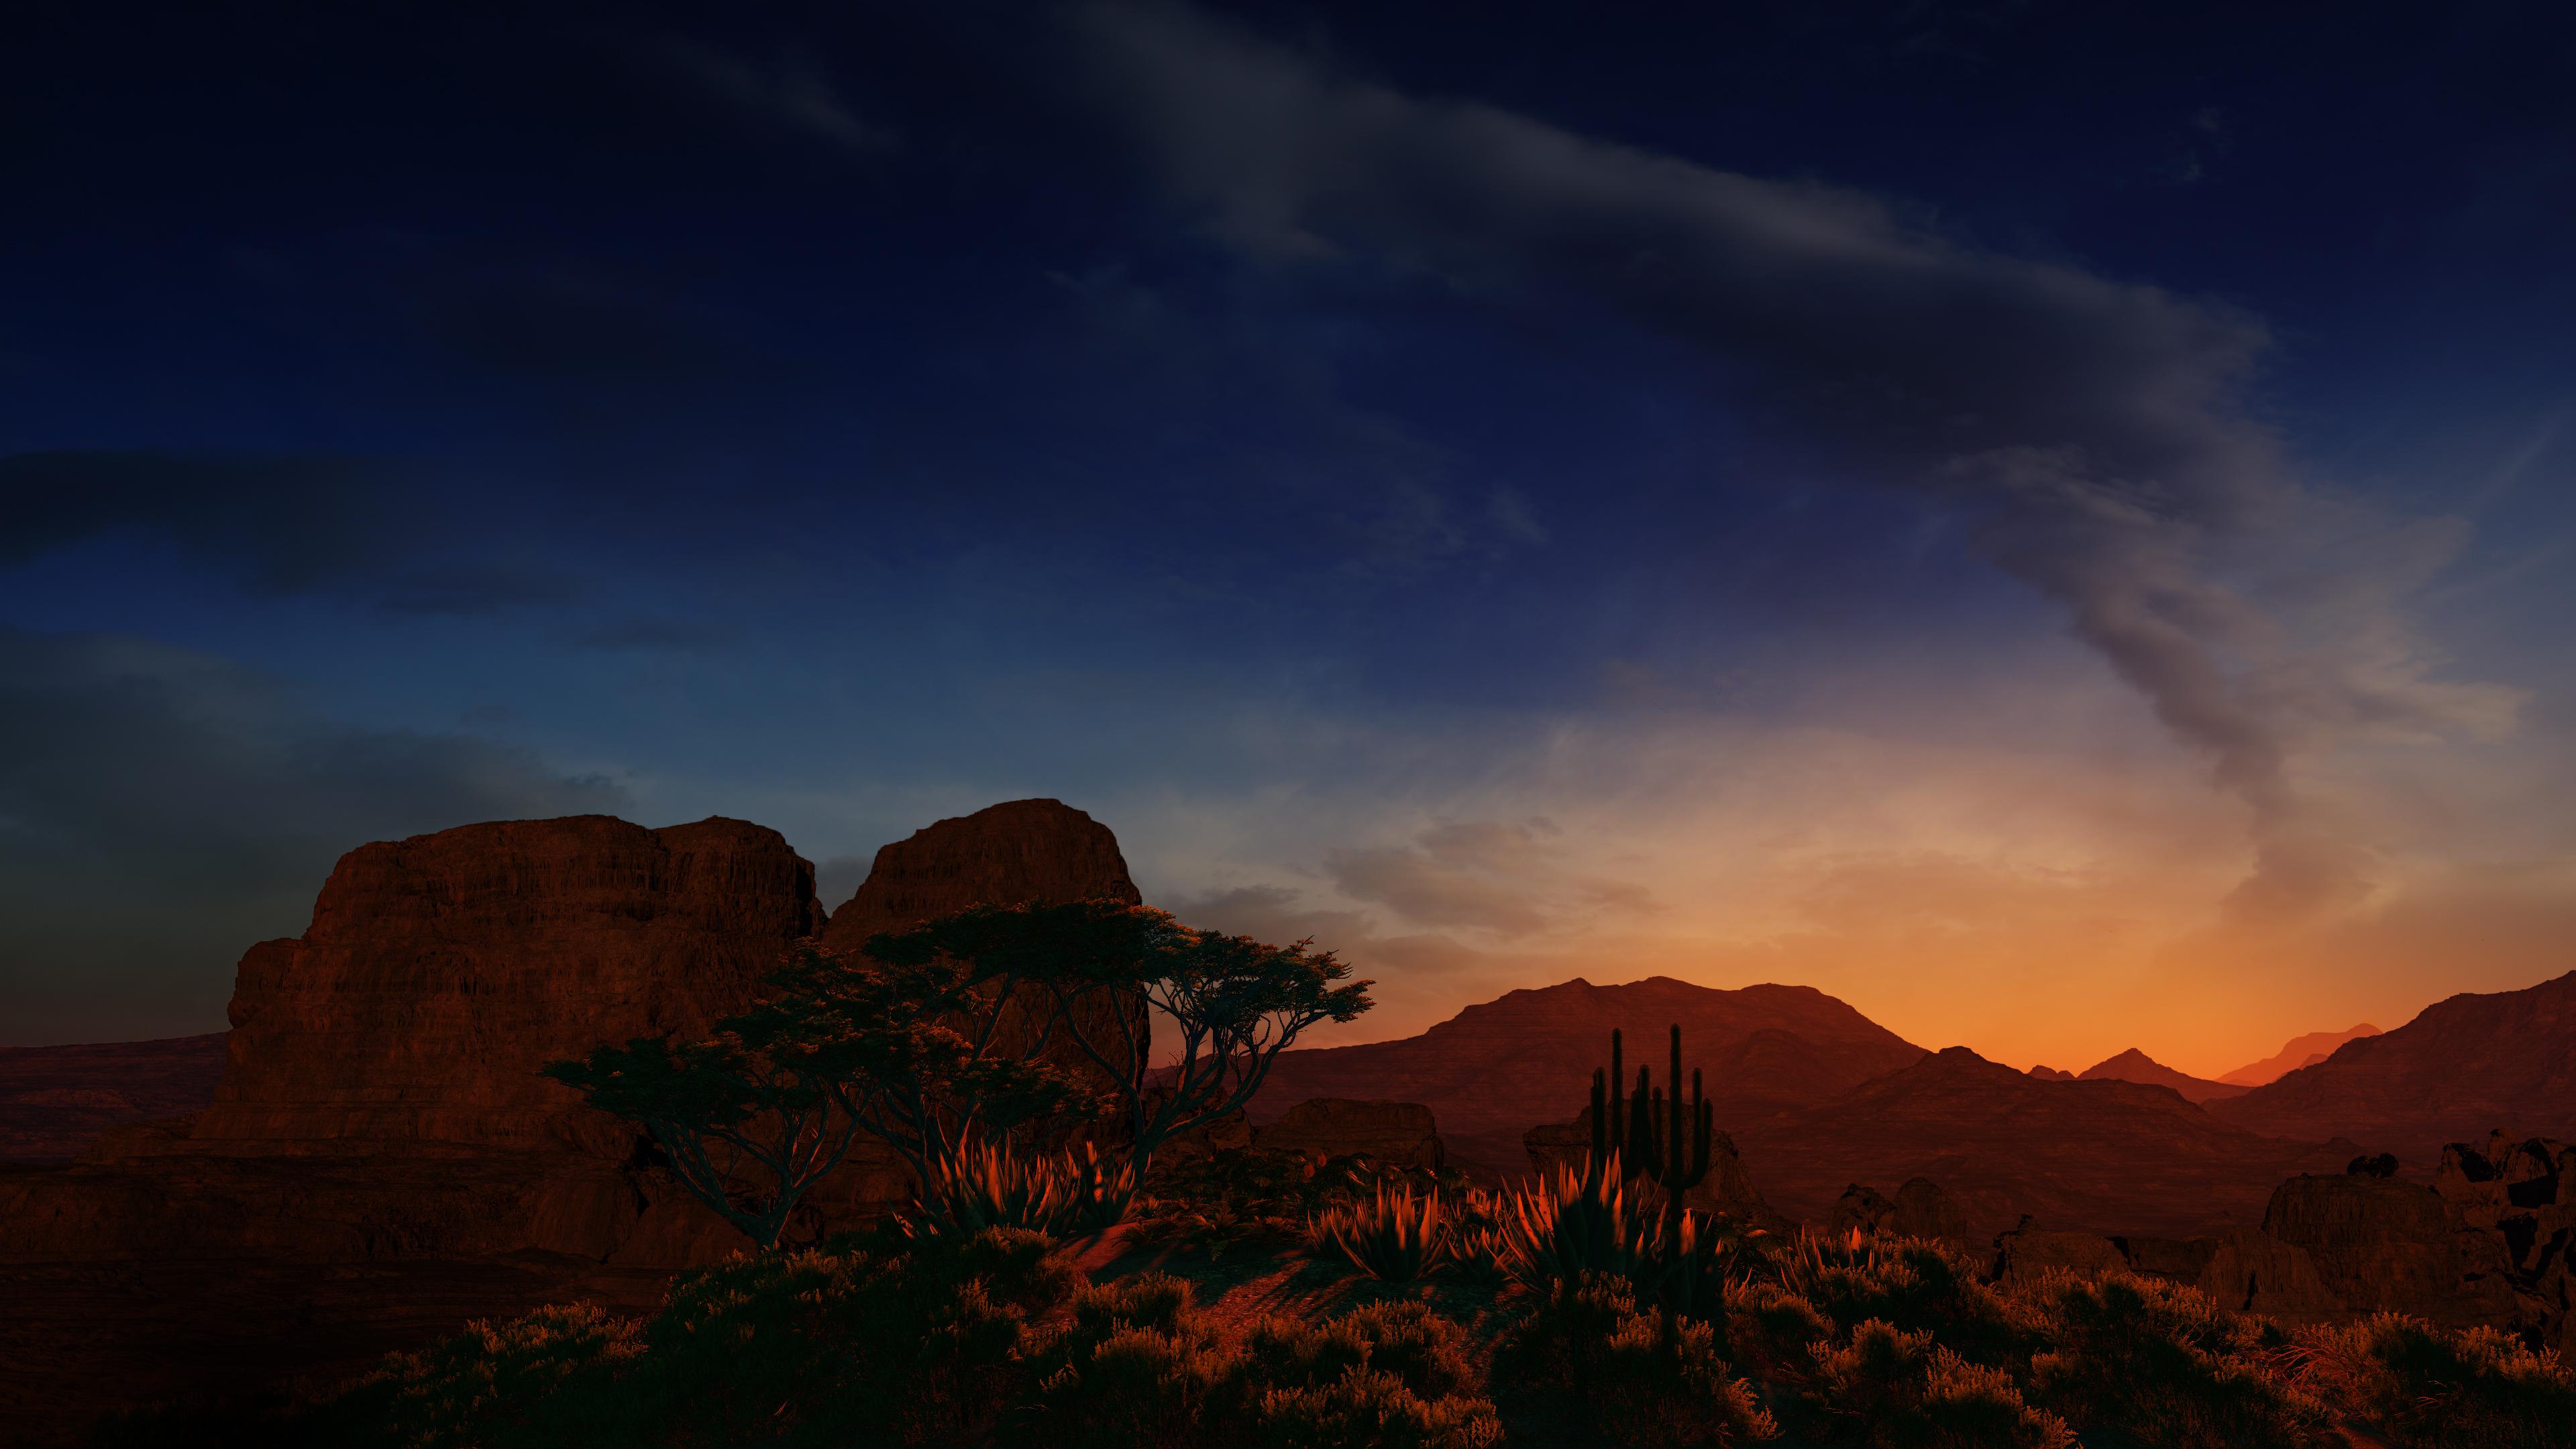 Arizona Sunset 4K